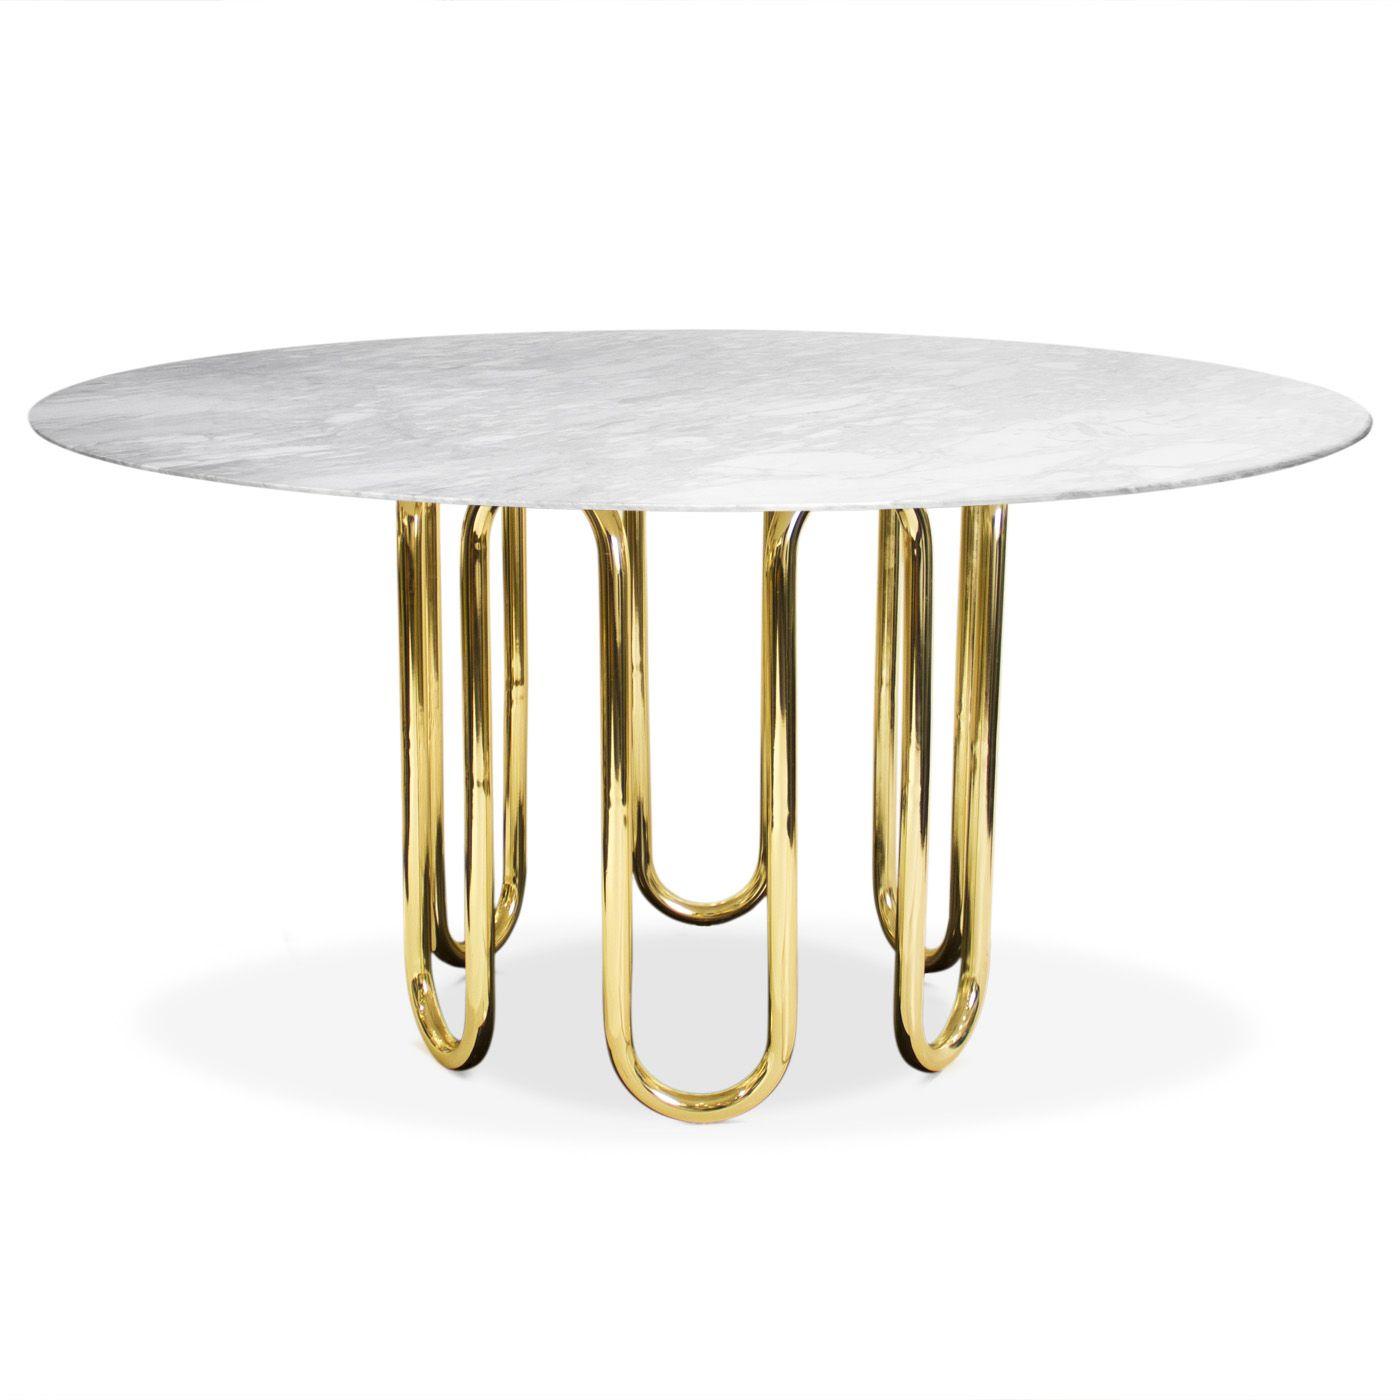 Modern Furniture   Scalinatella Dining Table   Jonathan Adler 137 Cm  Diameter X 74.5 Cm High